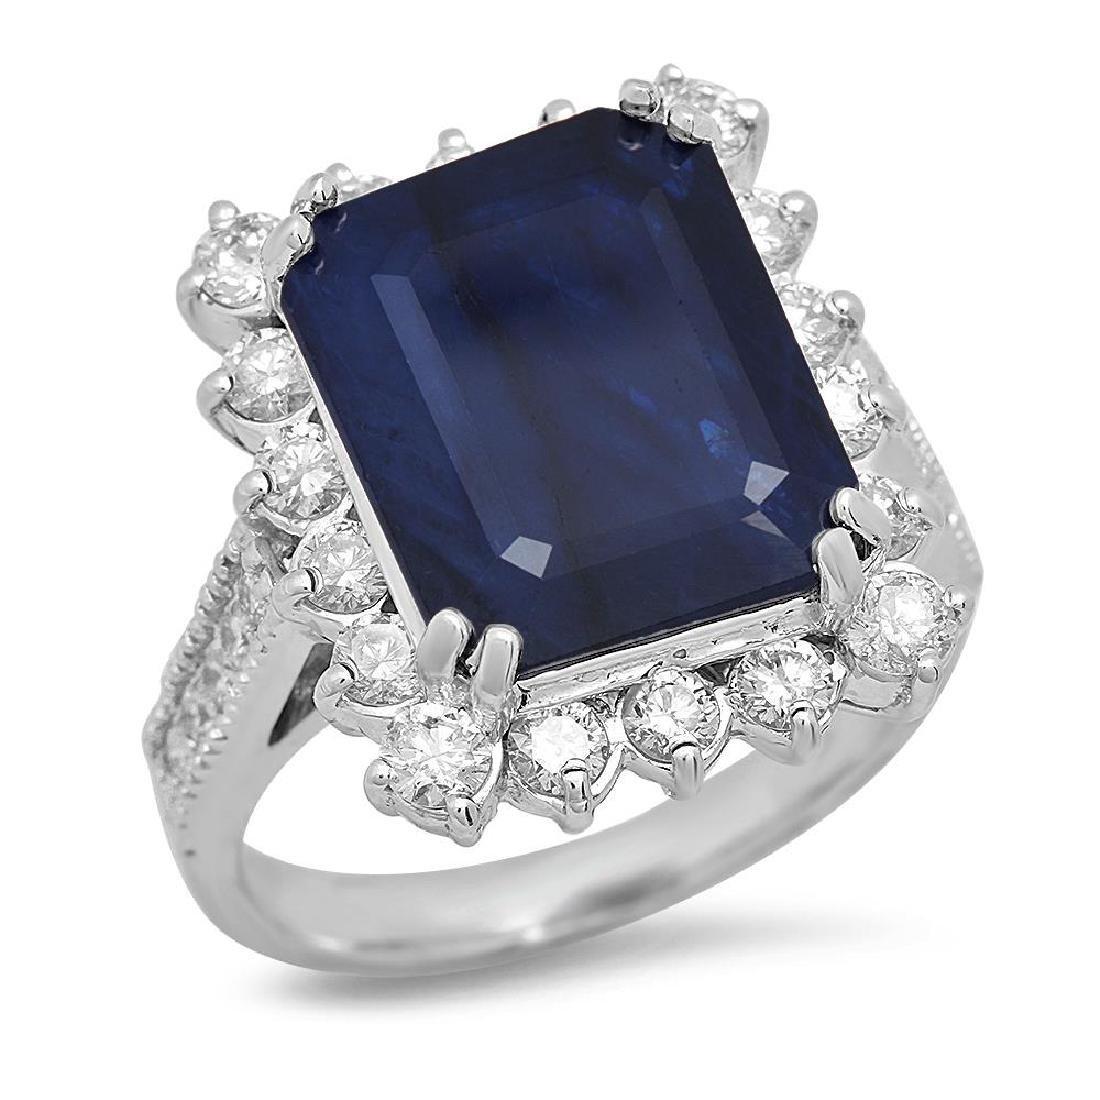 14K Gold 7.21ct Sapphire 1.25cts Diamond Ring